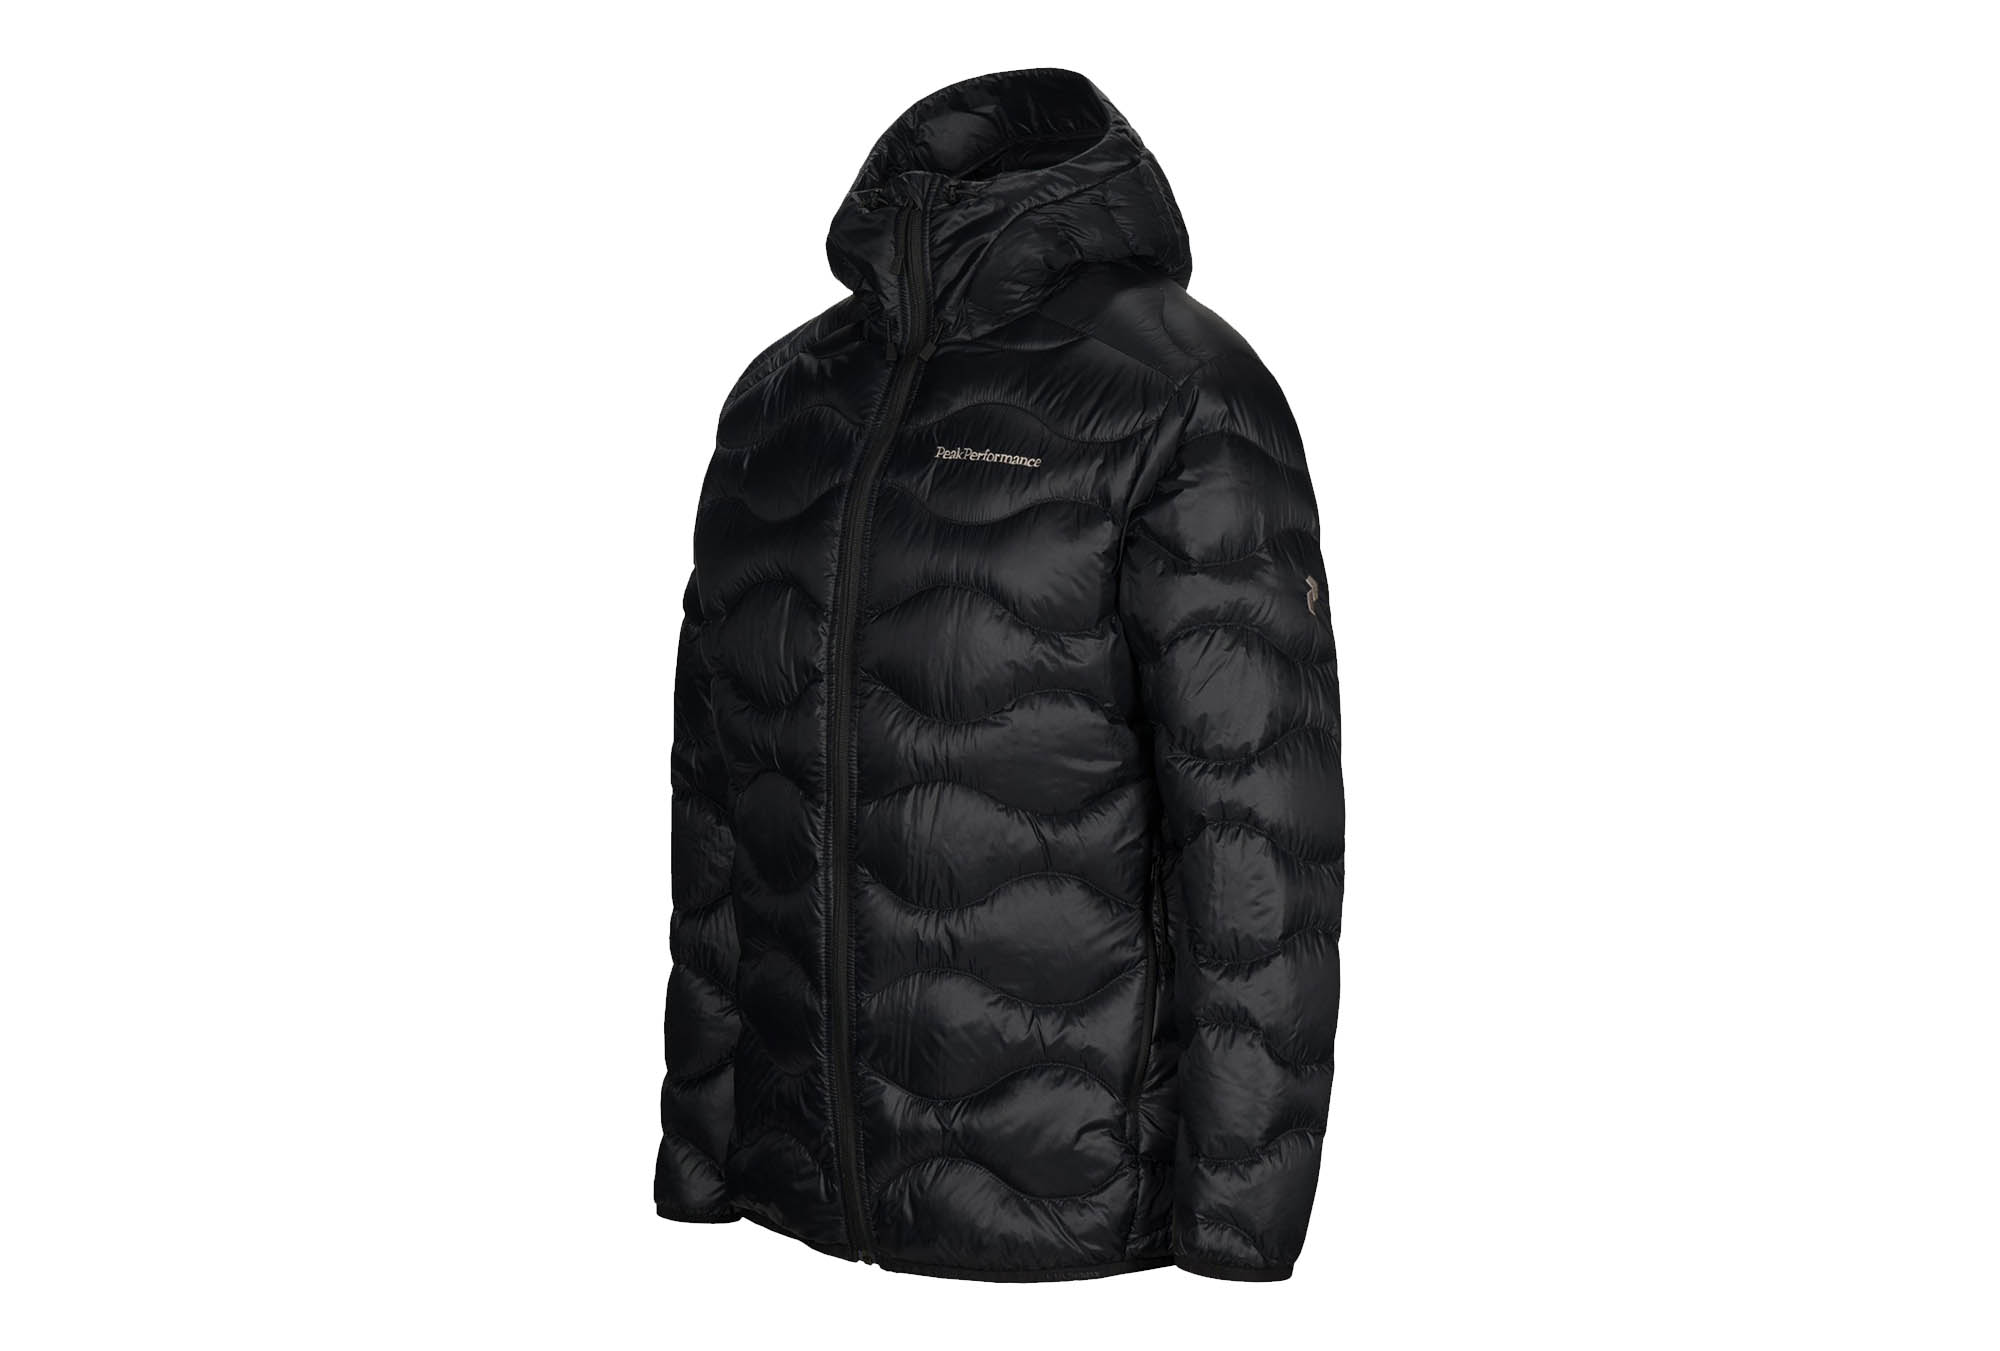 Winter 2020 Peak Performance World of Outdoor Sonthofen Allgäu Sportgeschäft Helium Hood Jacket n